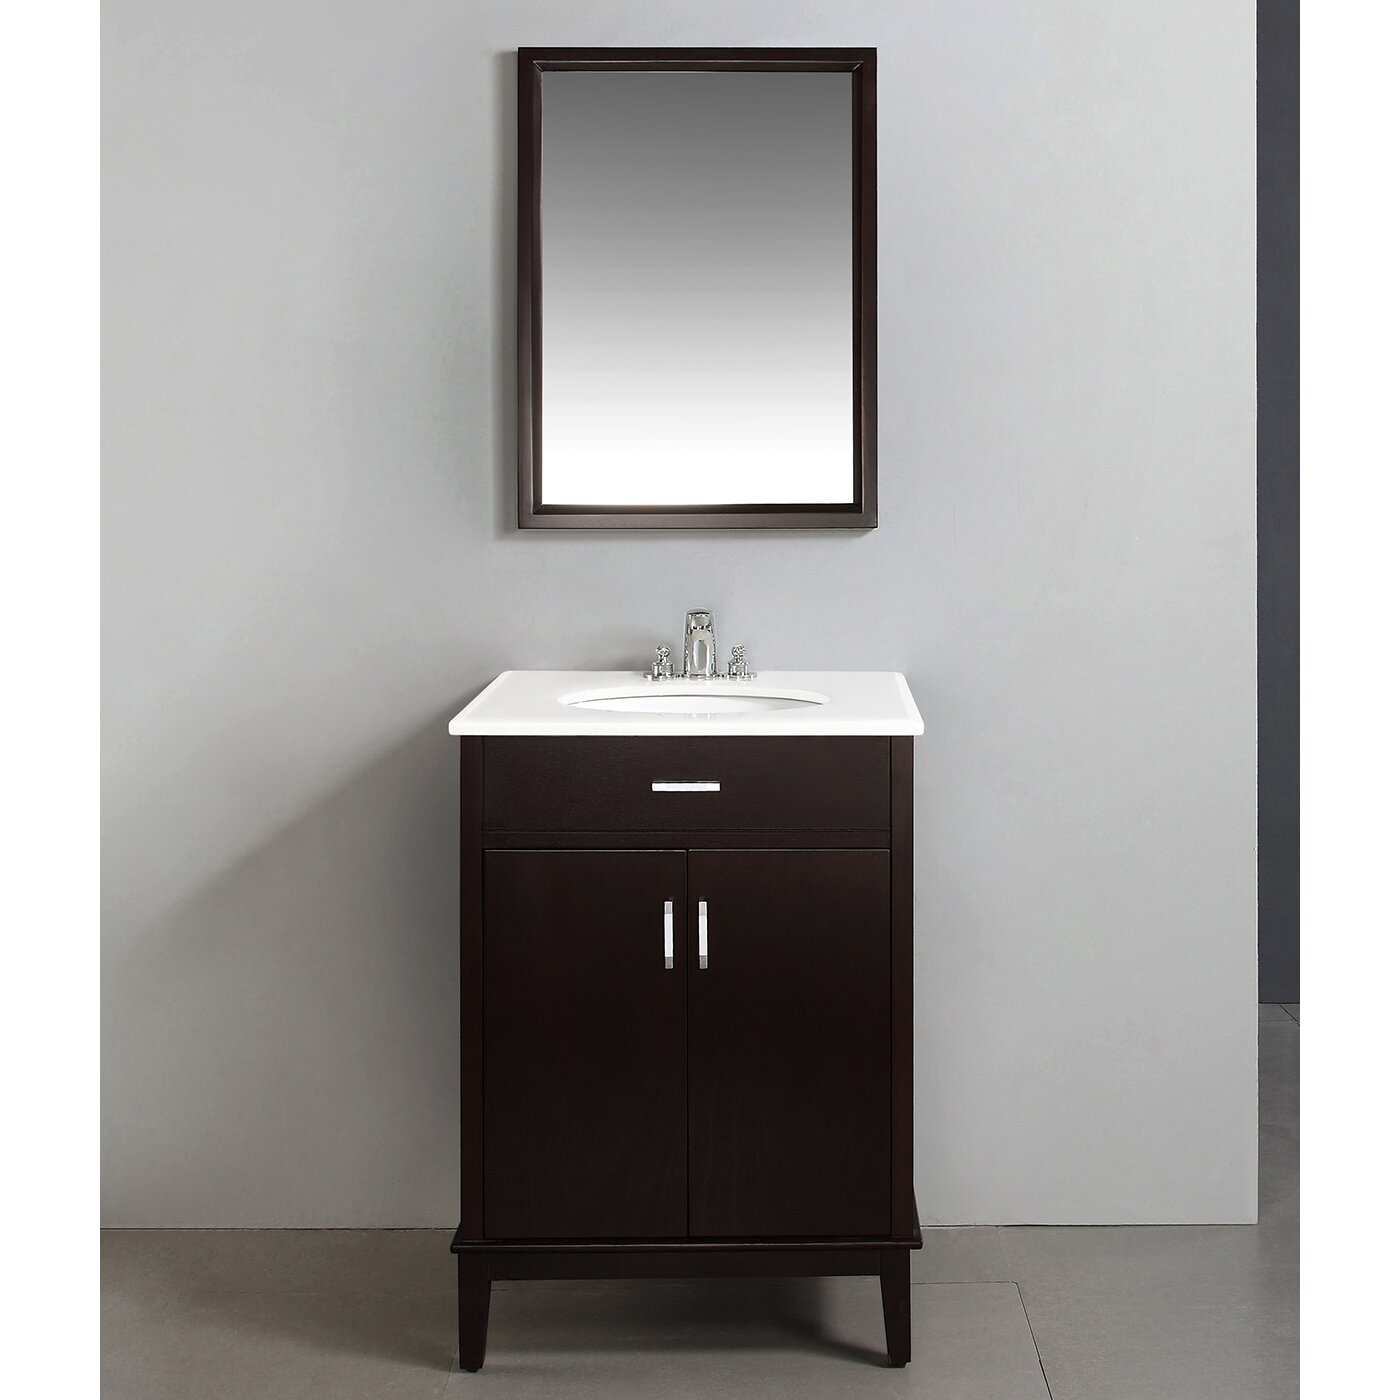 Simpli home urban loft 25 single bathroom vanity set for Bathroom cabinets urban ladder